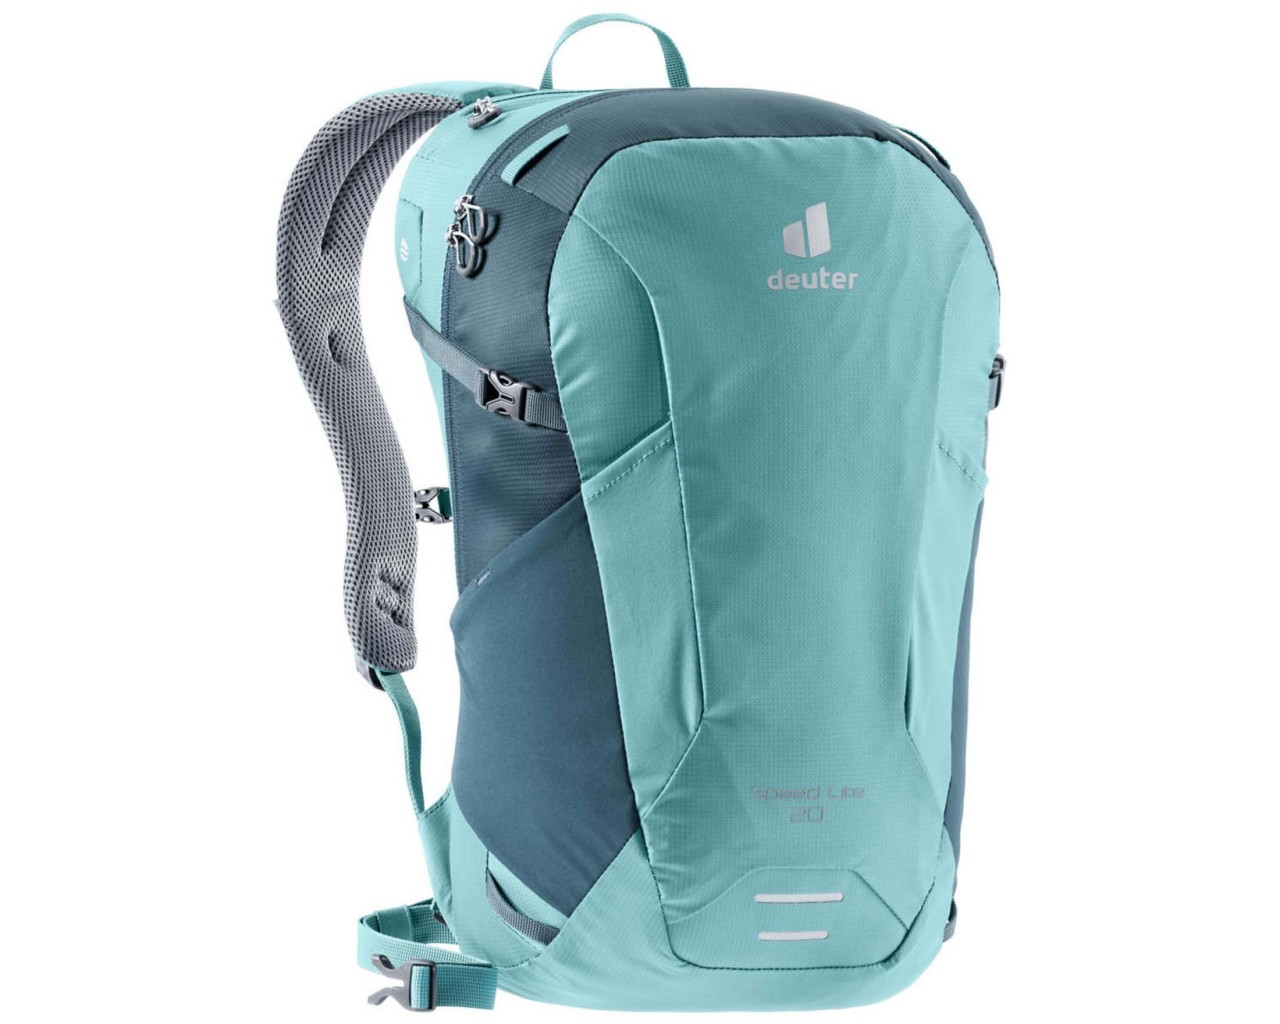 Deuter Speed Lite 20 litres Backpack PFC-free | dustblue-arctic